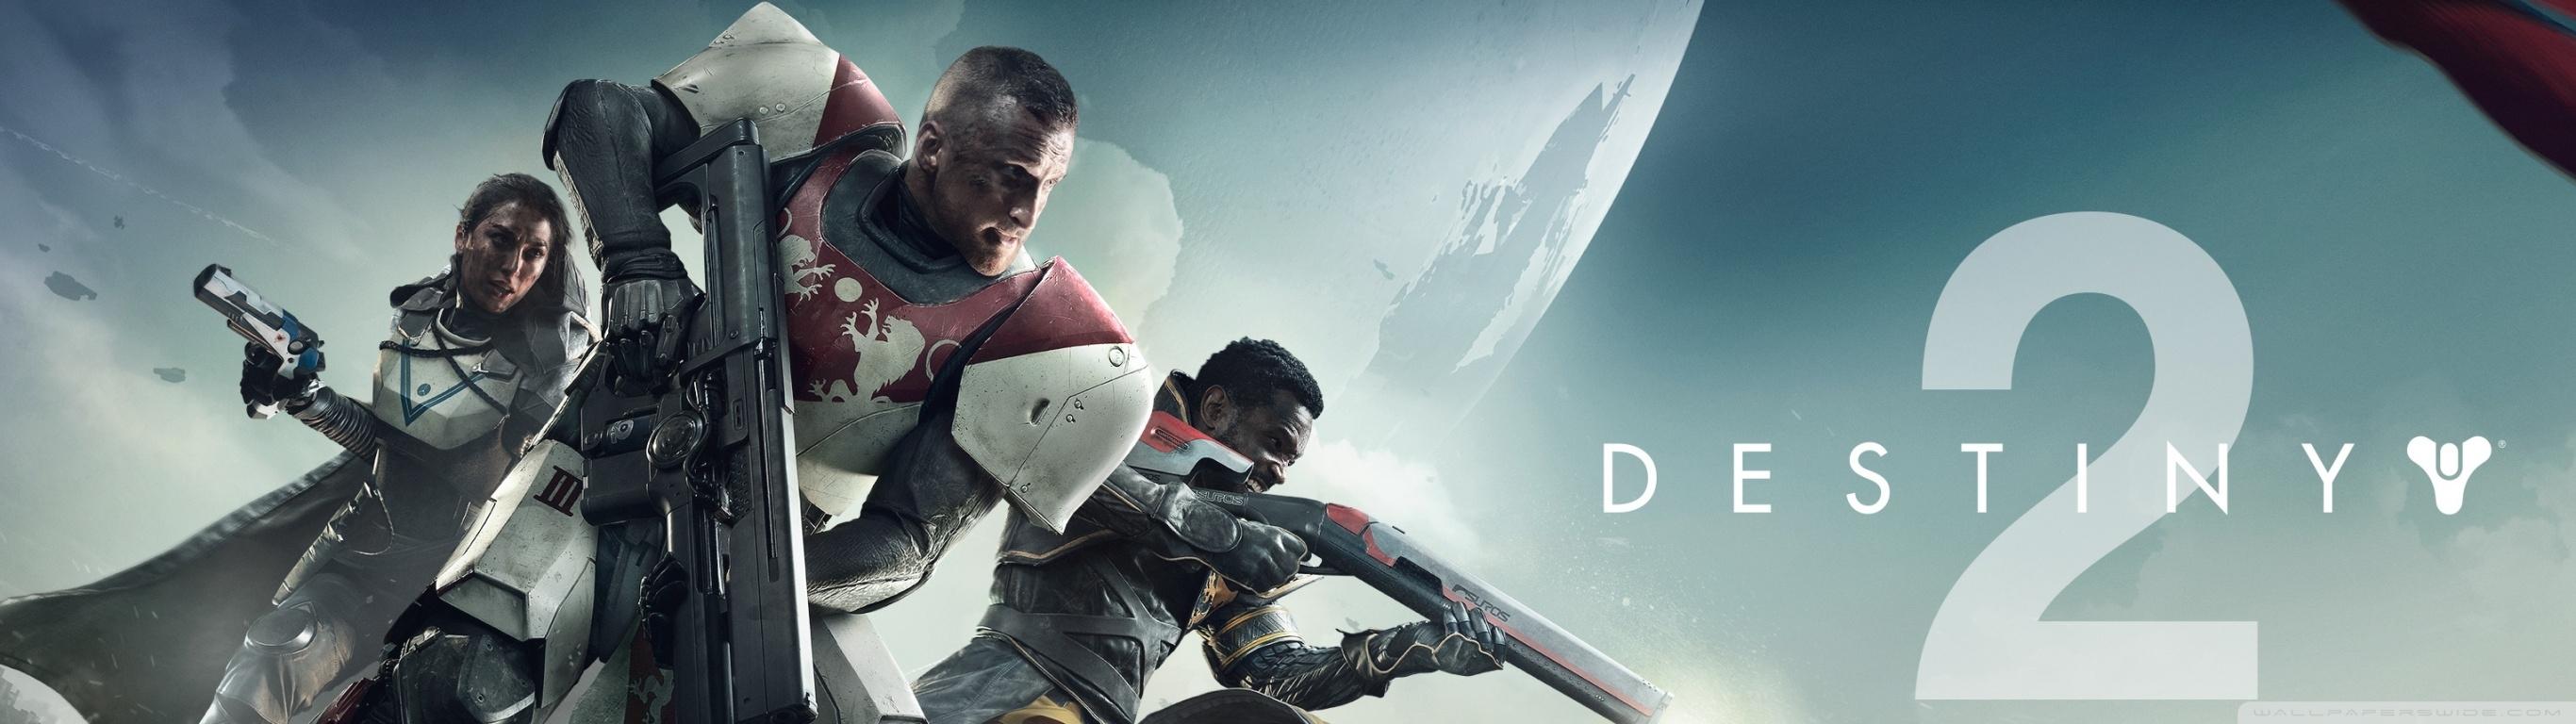 destiny 2 2017 video game ❤ 4k hd desktop wallpaper for • wide